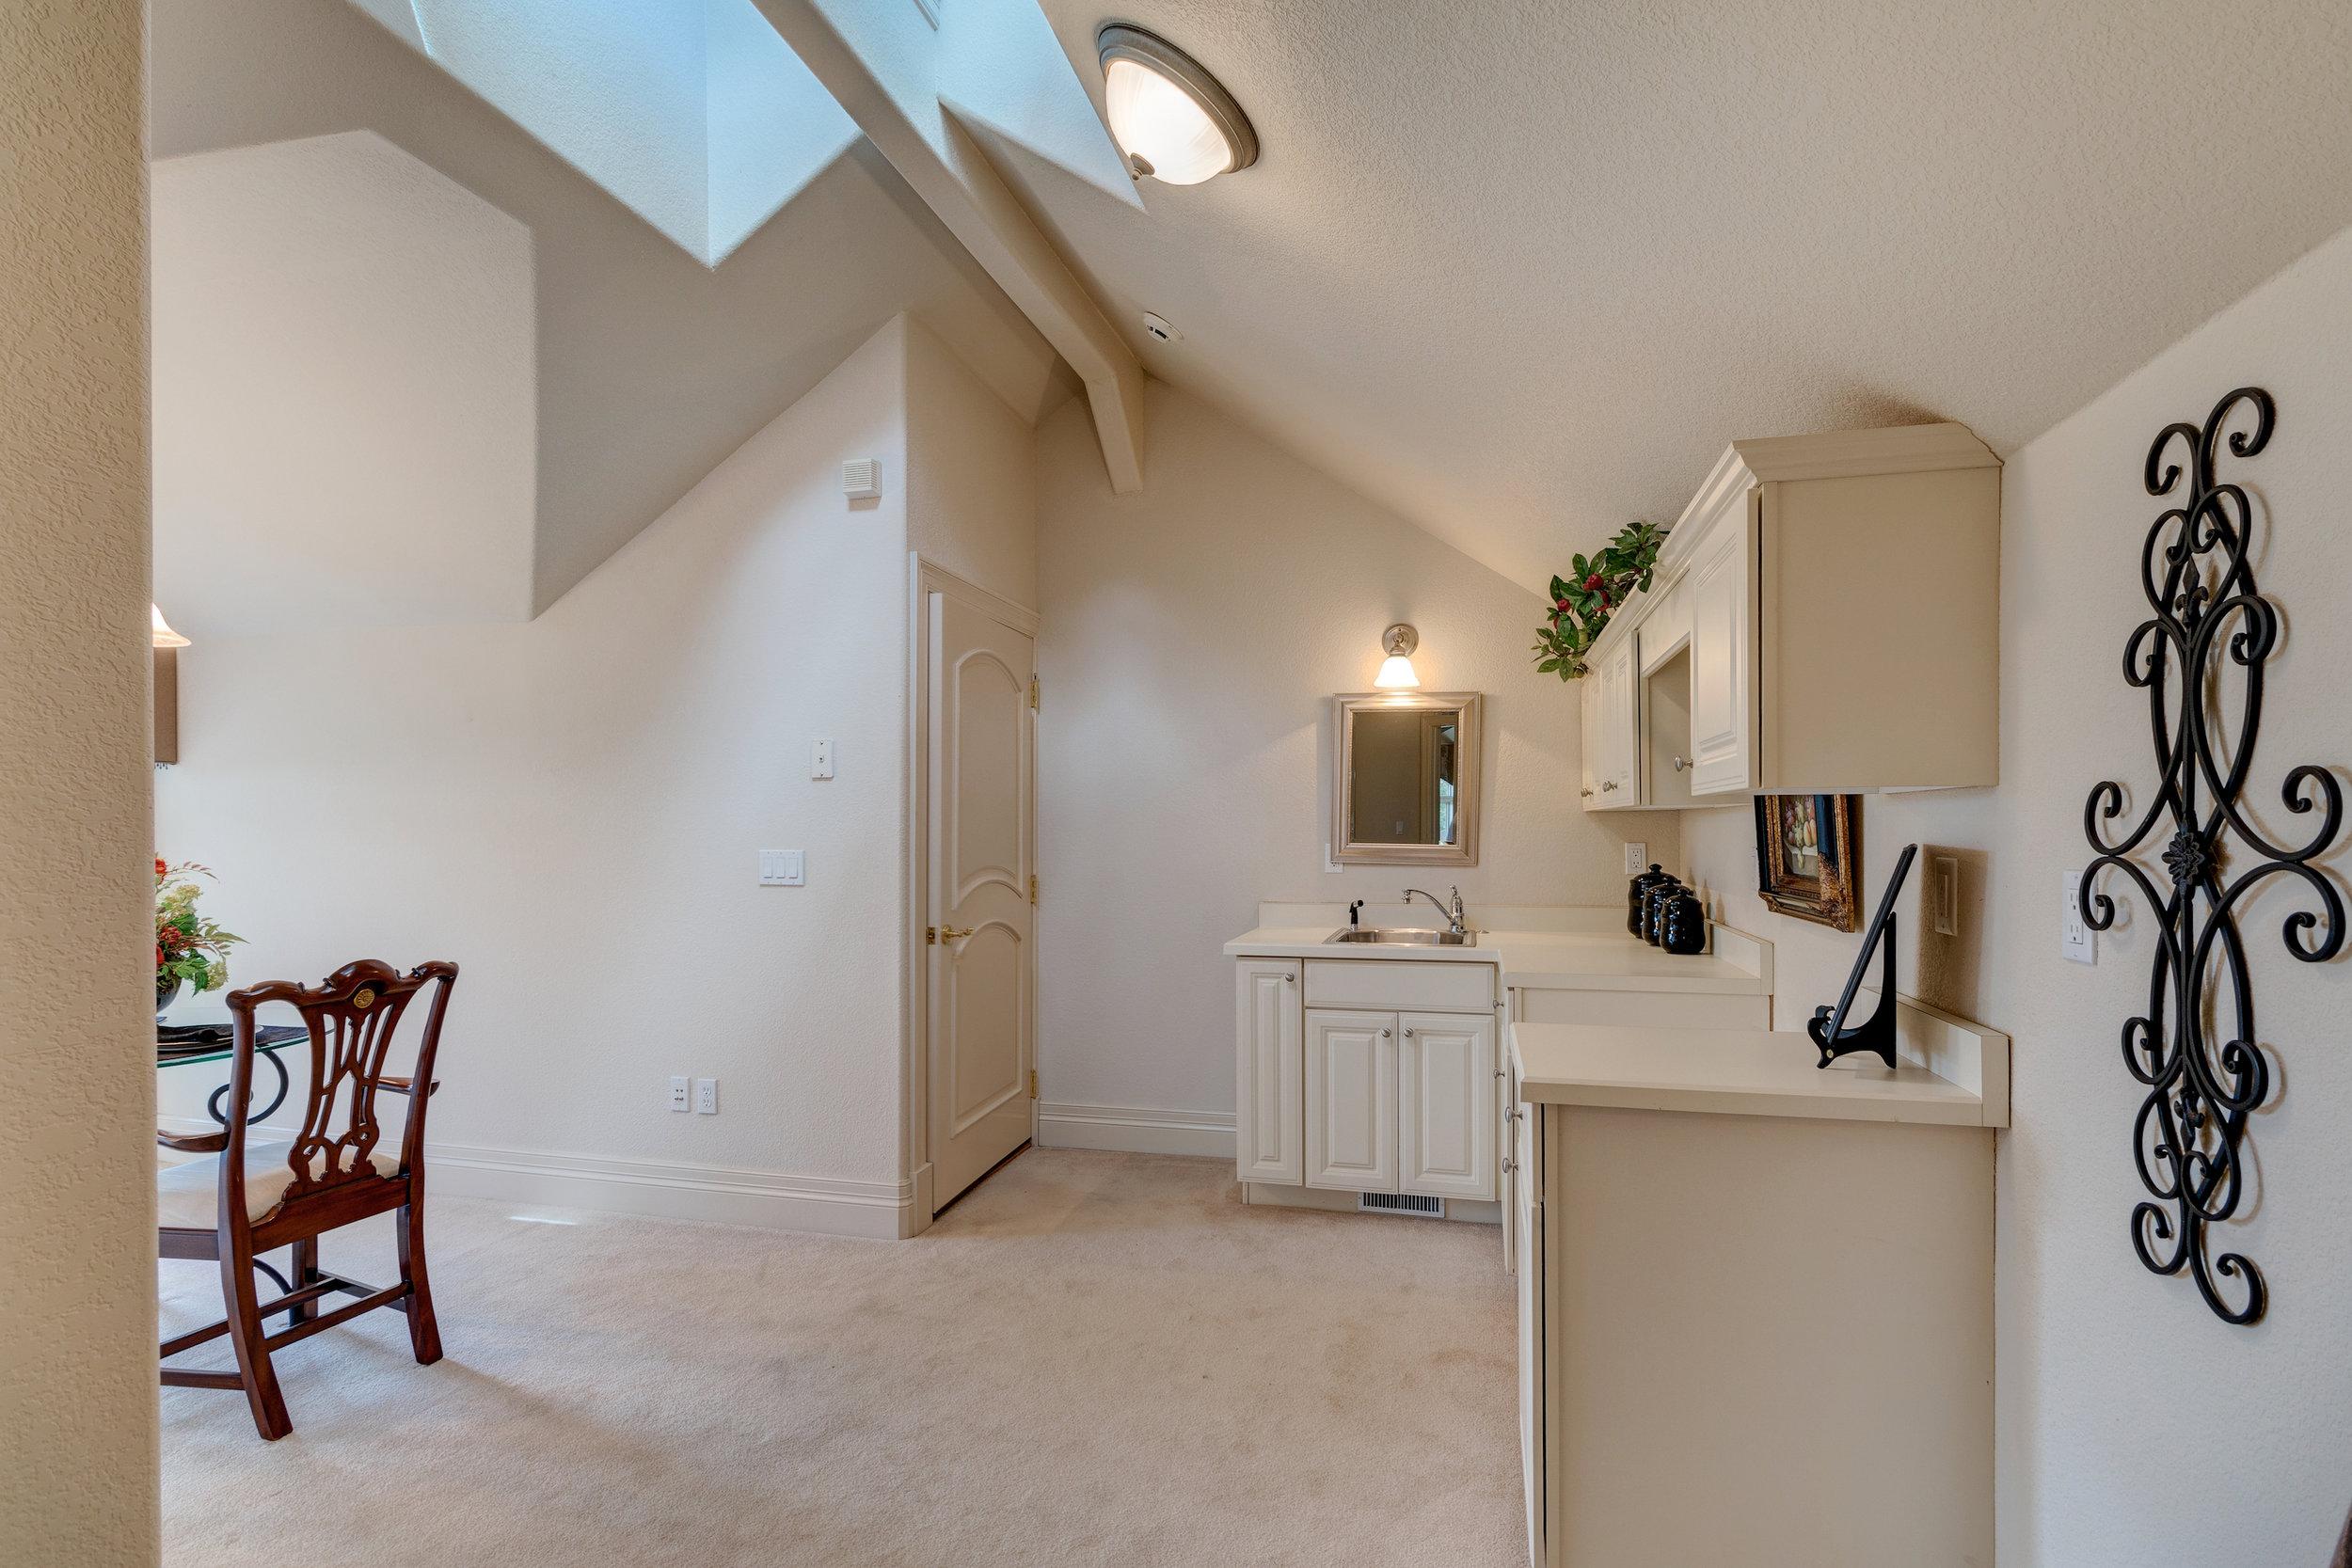 30-Upper level apartment.jpg